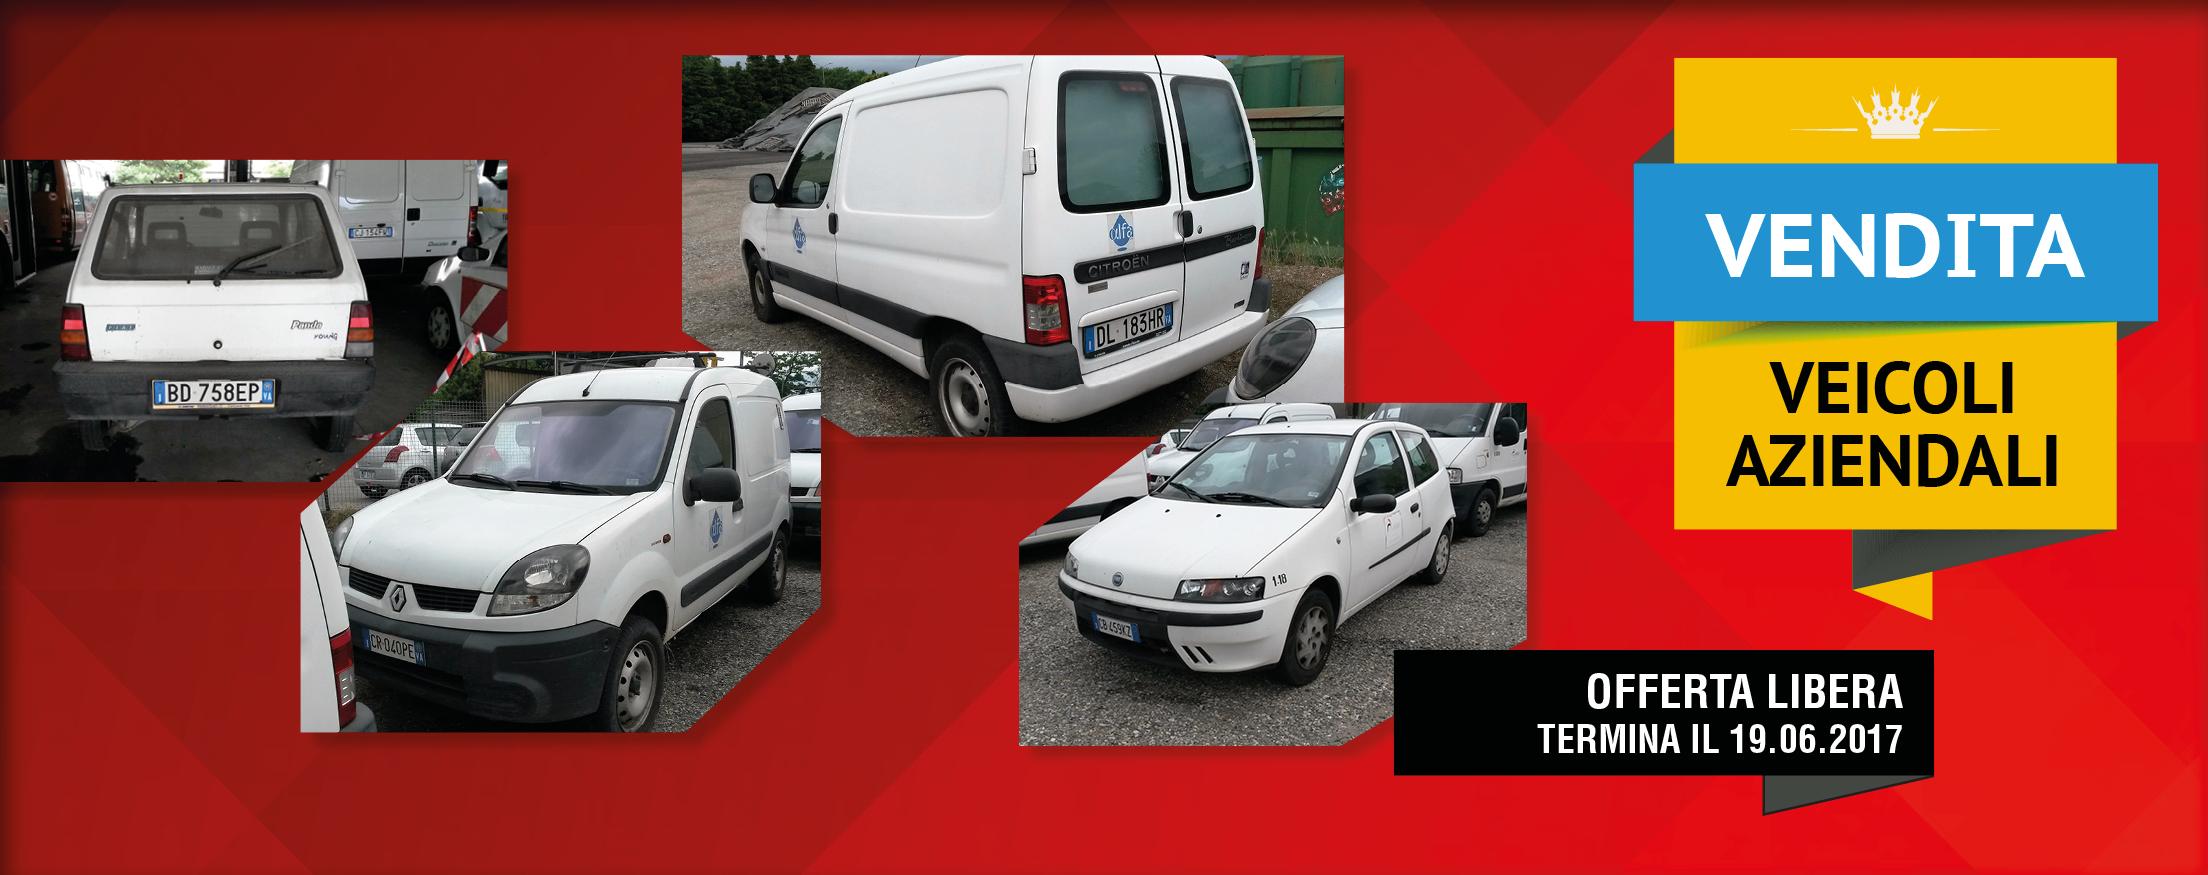 Immagine vendita veicoli aziendali